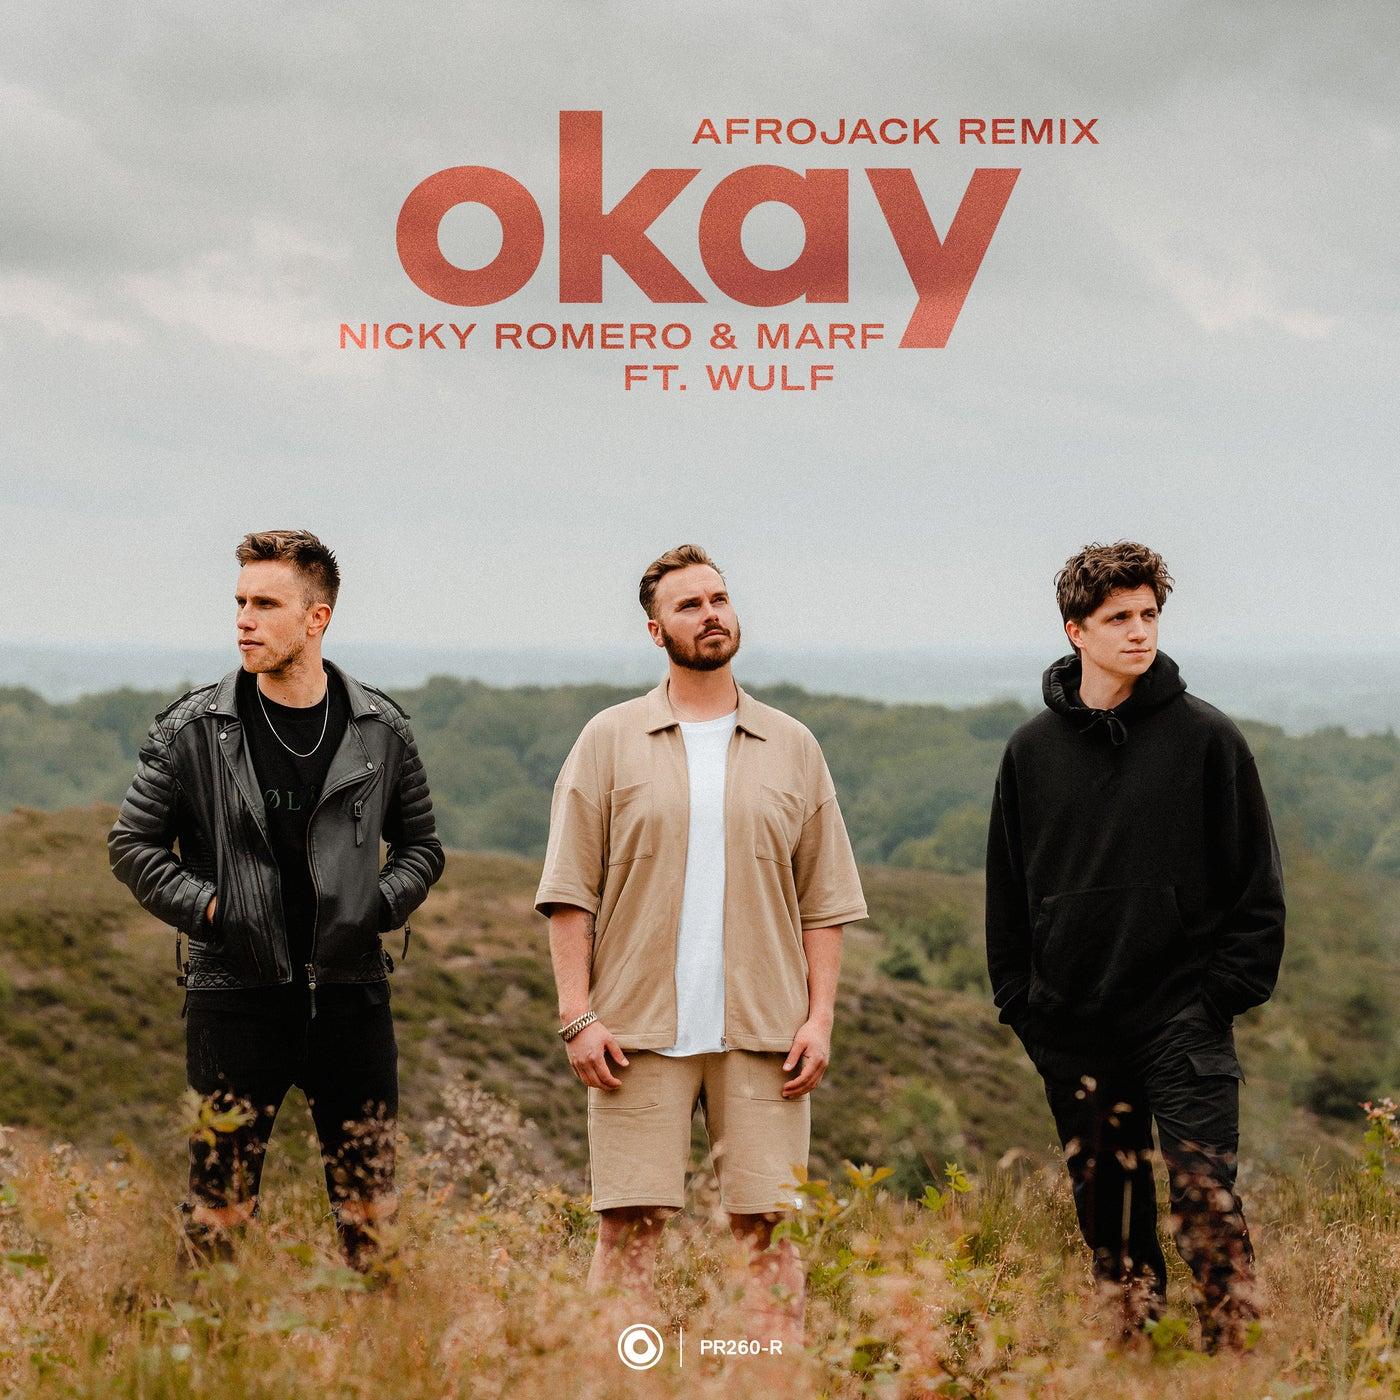 Okay feat. Wulf (Extended Afrojack Remix)